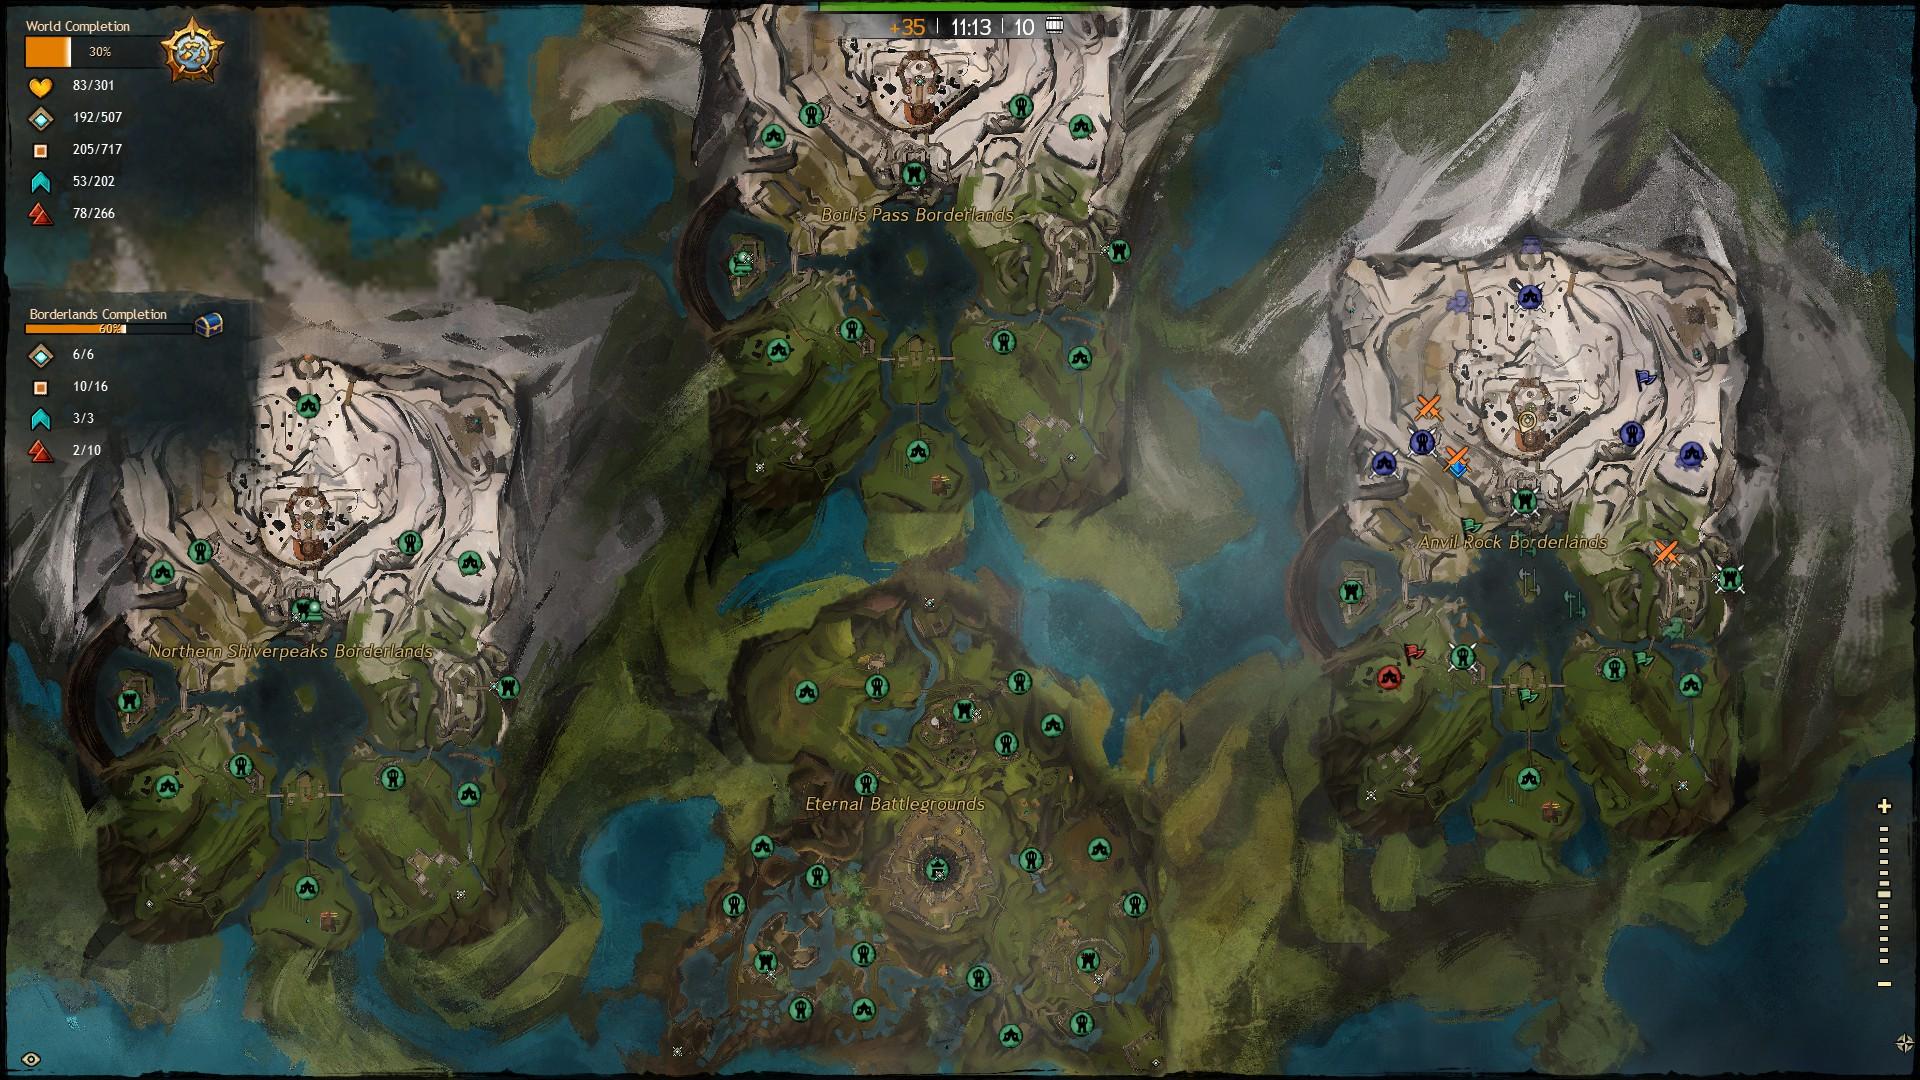 Guild Wars 1 World Map.Guild Wars 2 World Vs World Map Image Comradewinston Mod Db